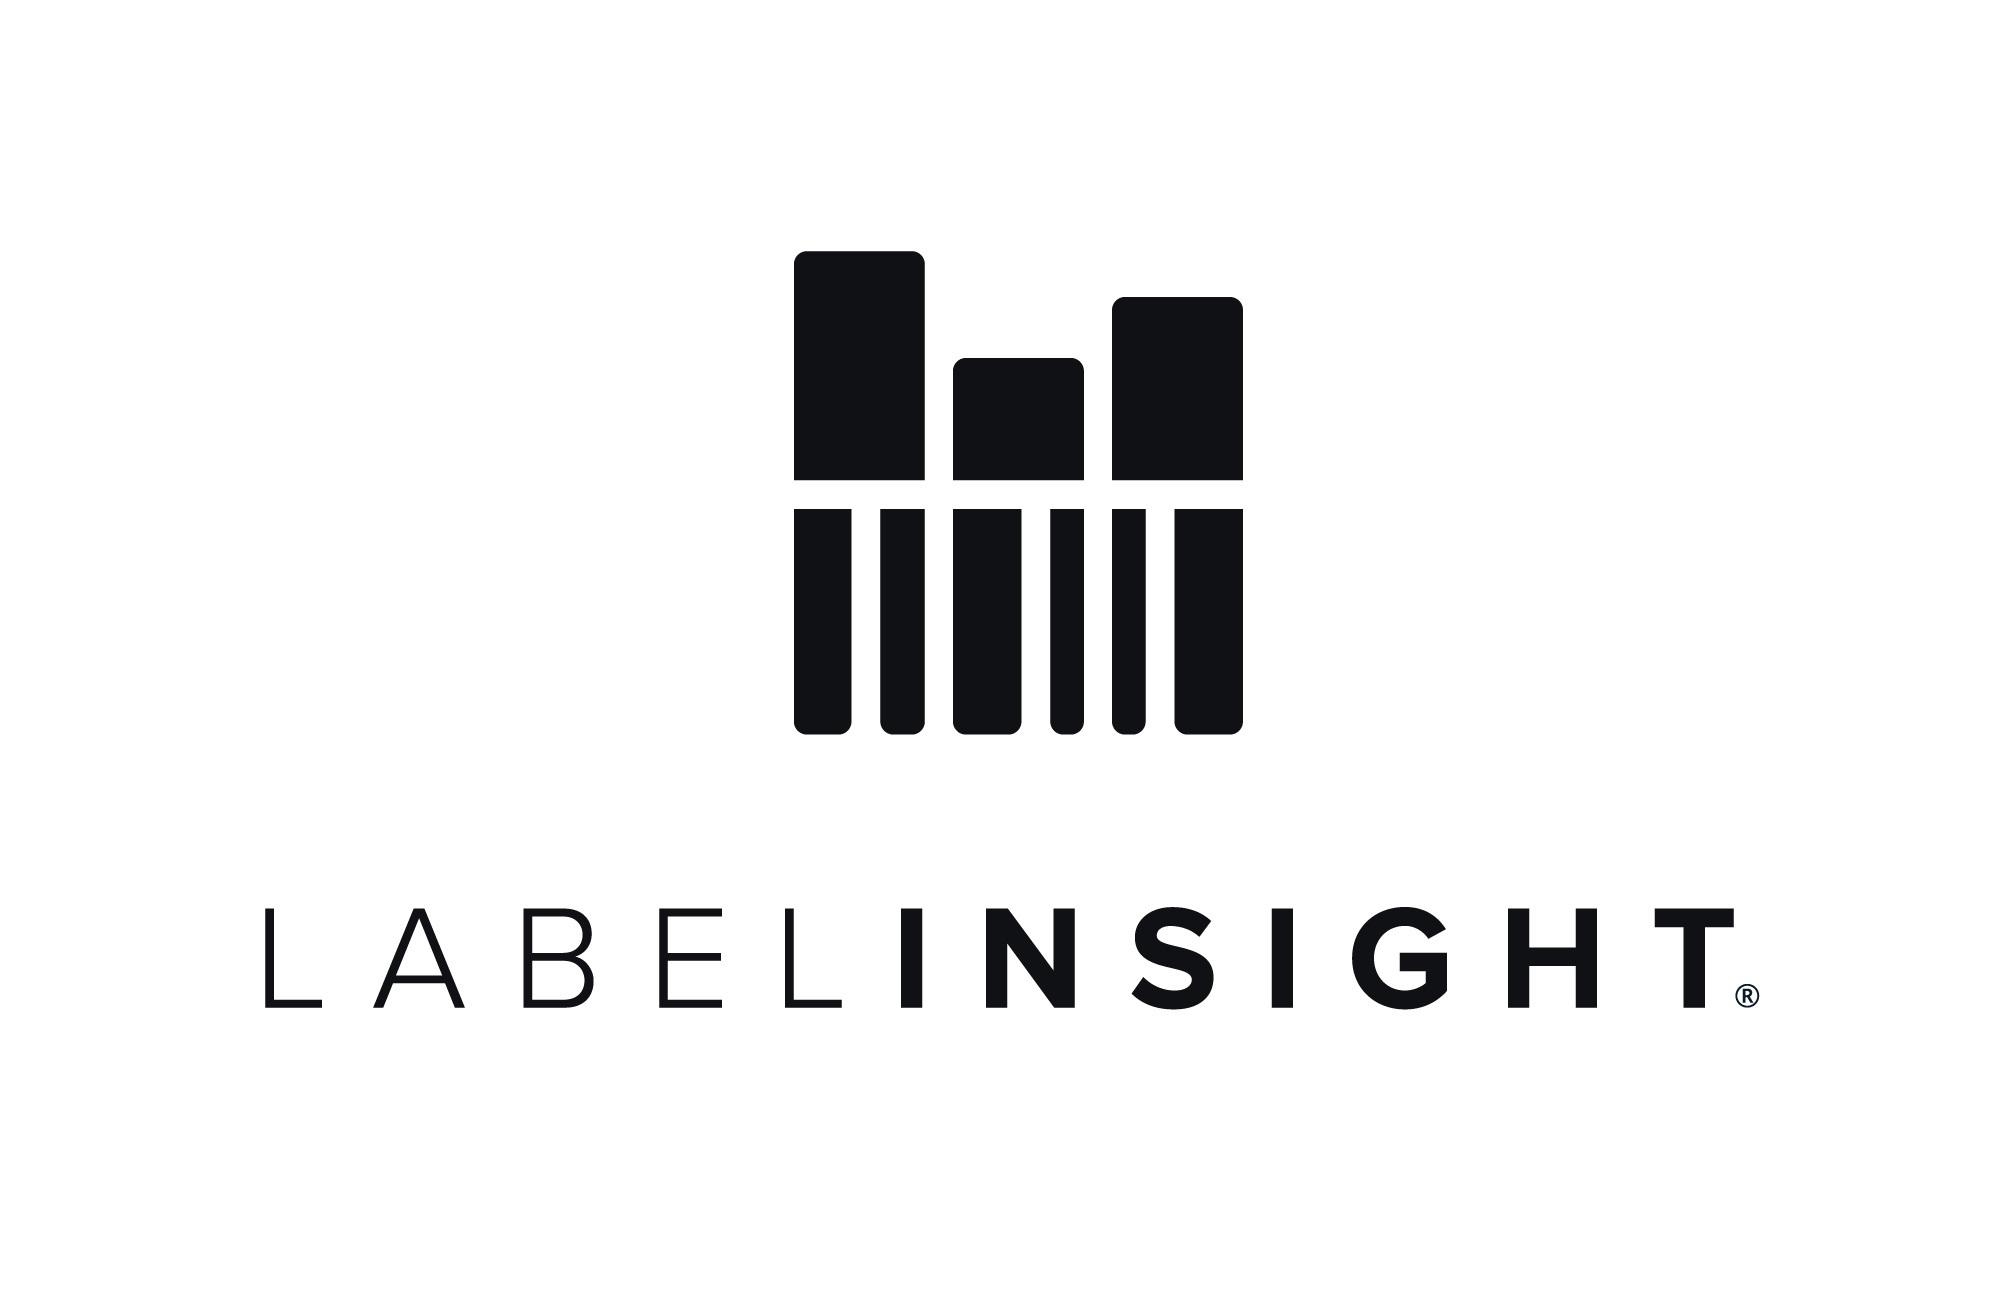 Label Insight logo